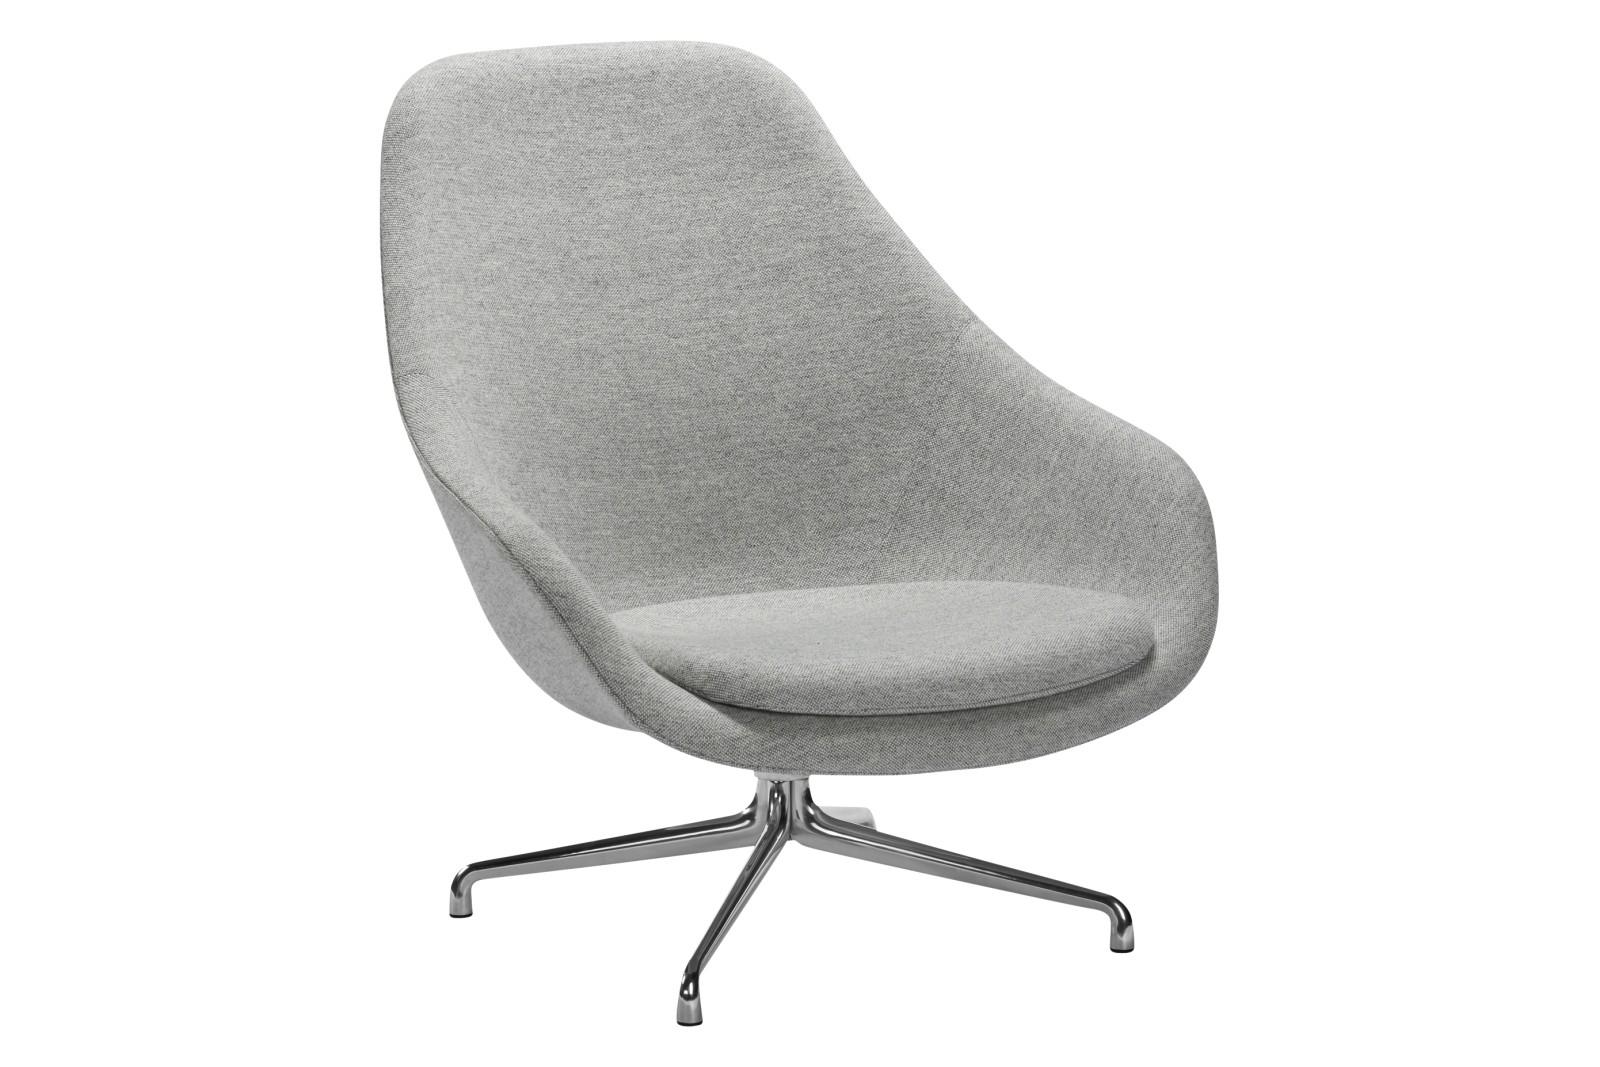 AAL 91 Lounge Chair - Fixed Seat Cushion Fabric Group 4, Metal Polished Aluminium